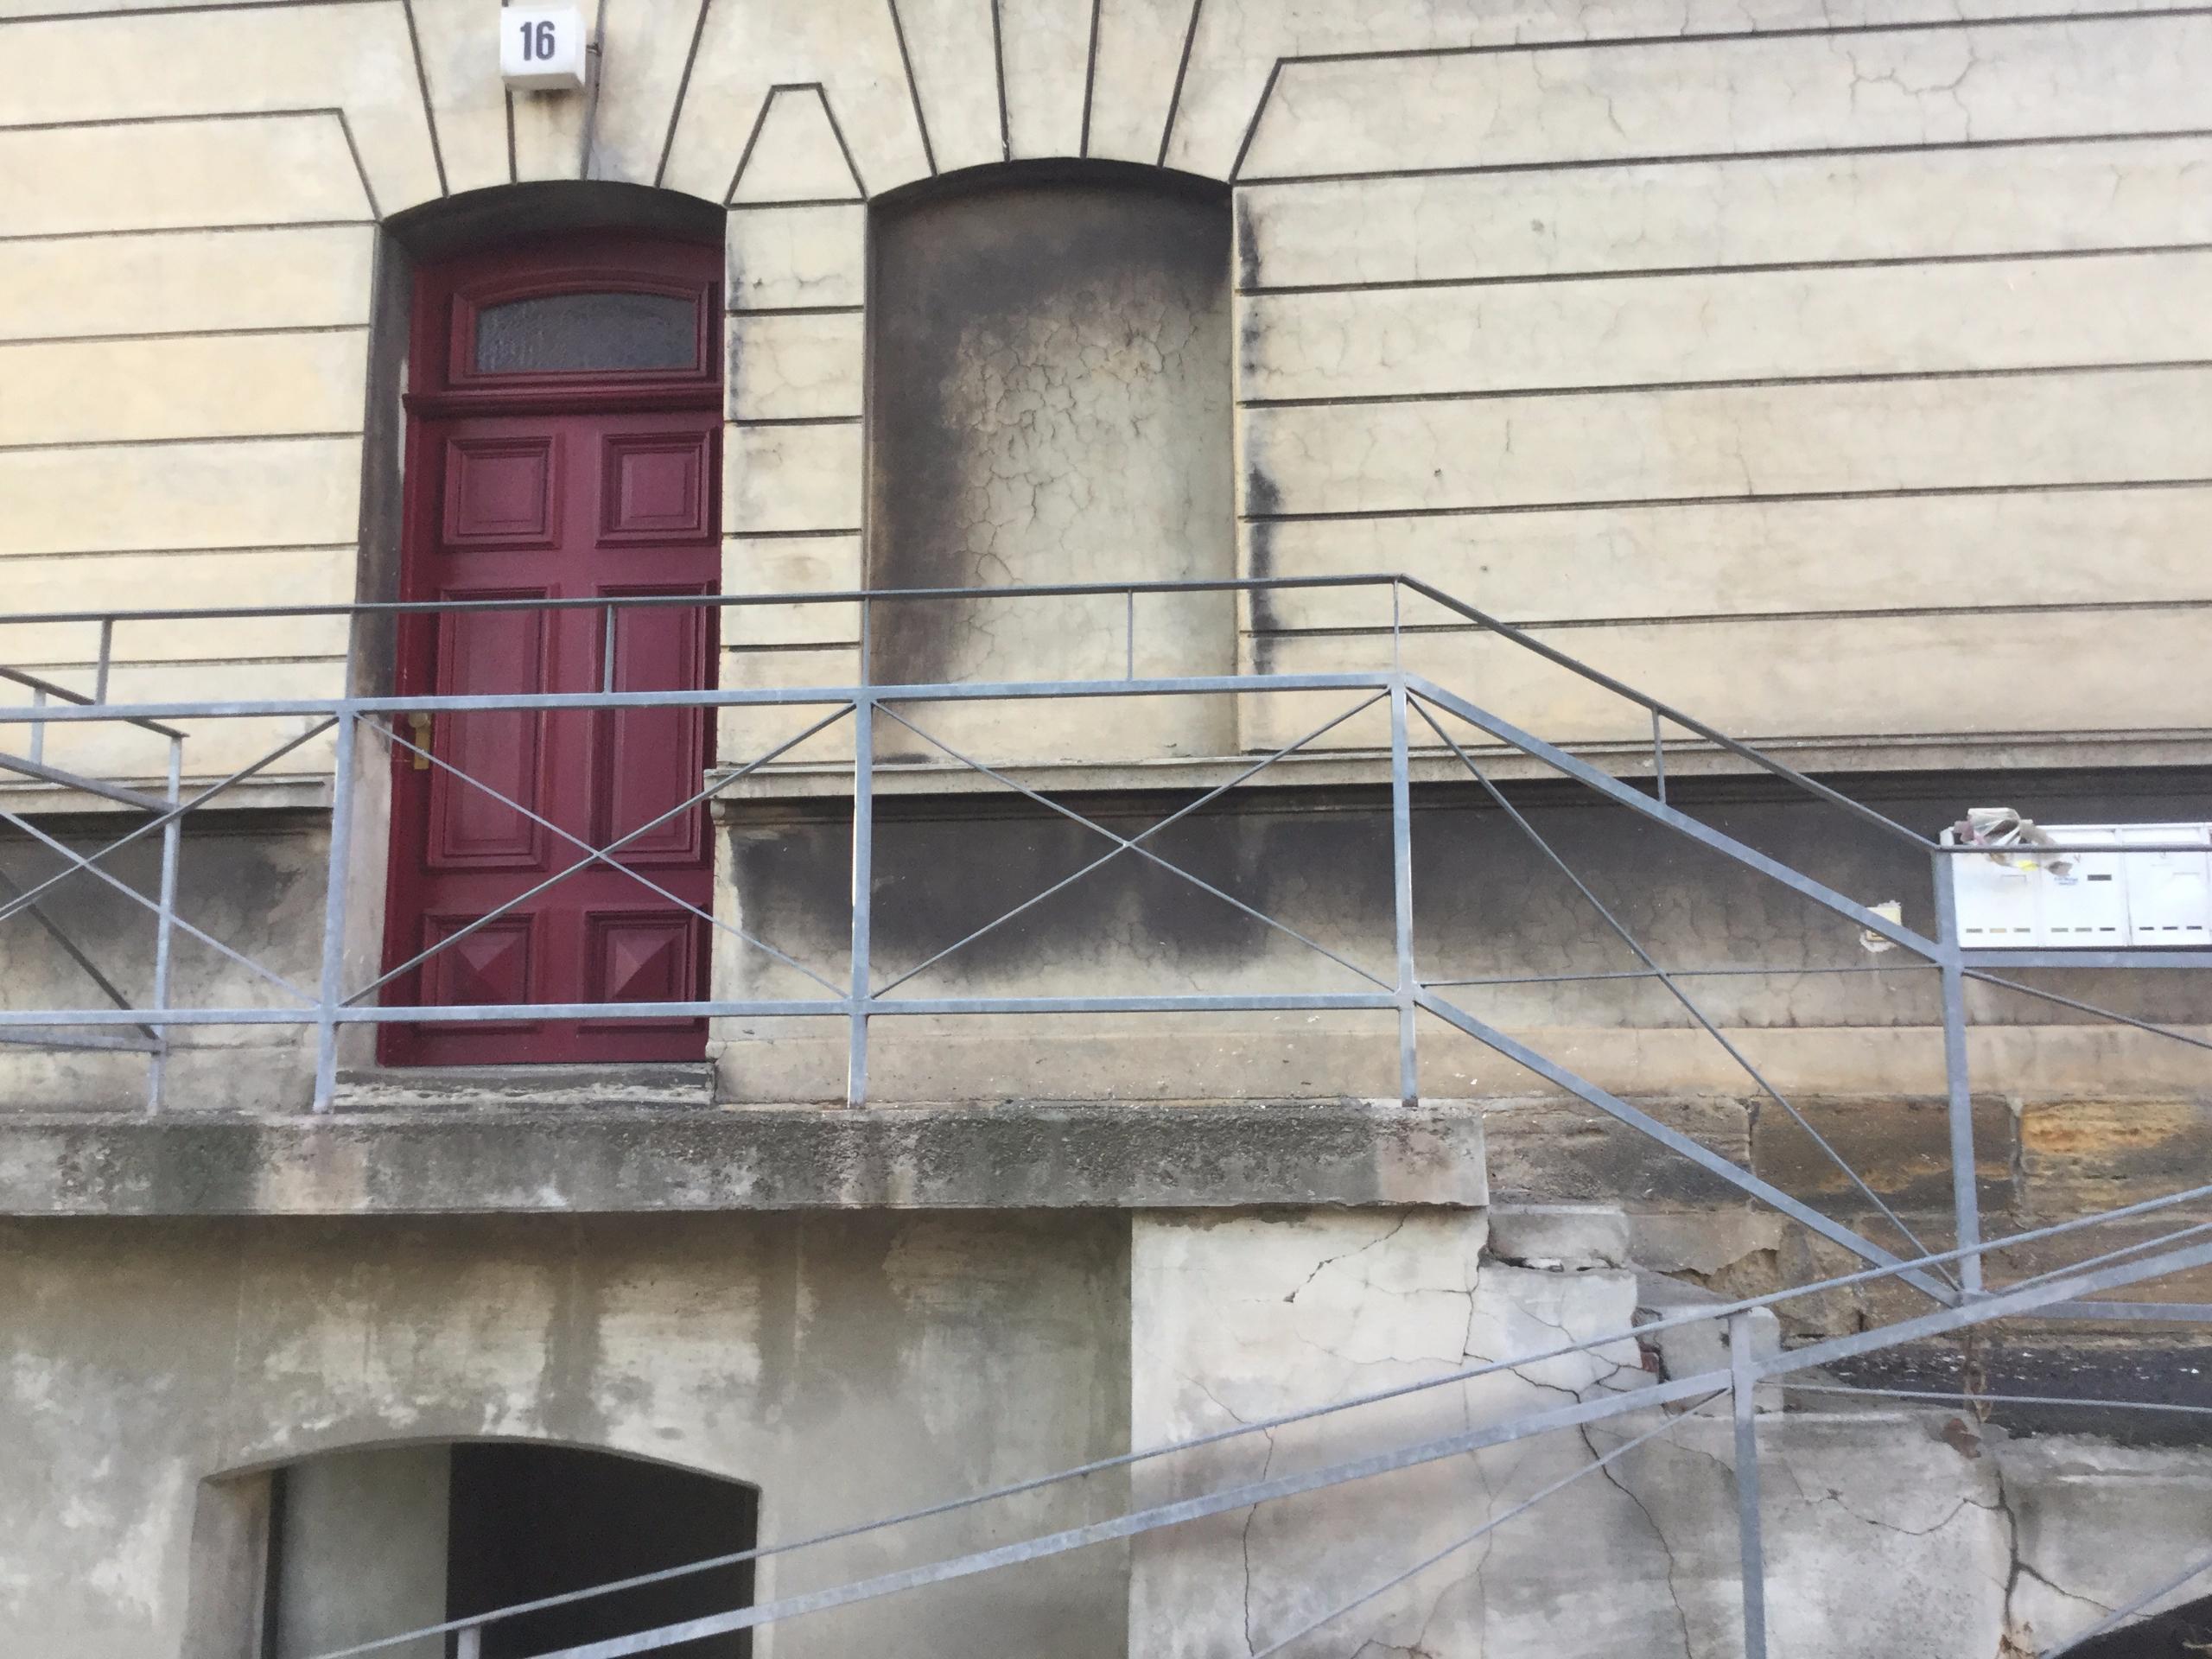 photography, architecture, buildings - creative-insanity | ello